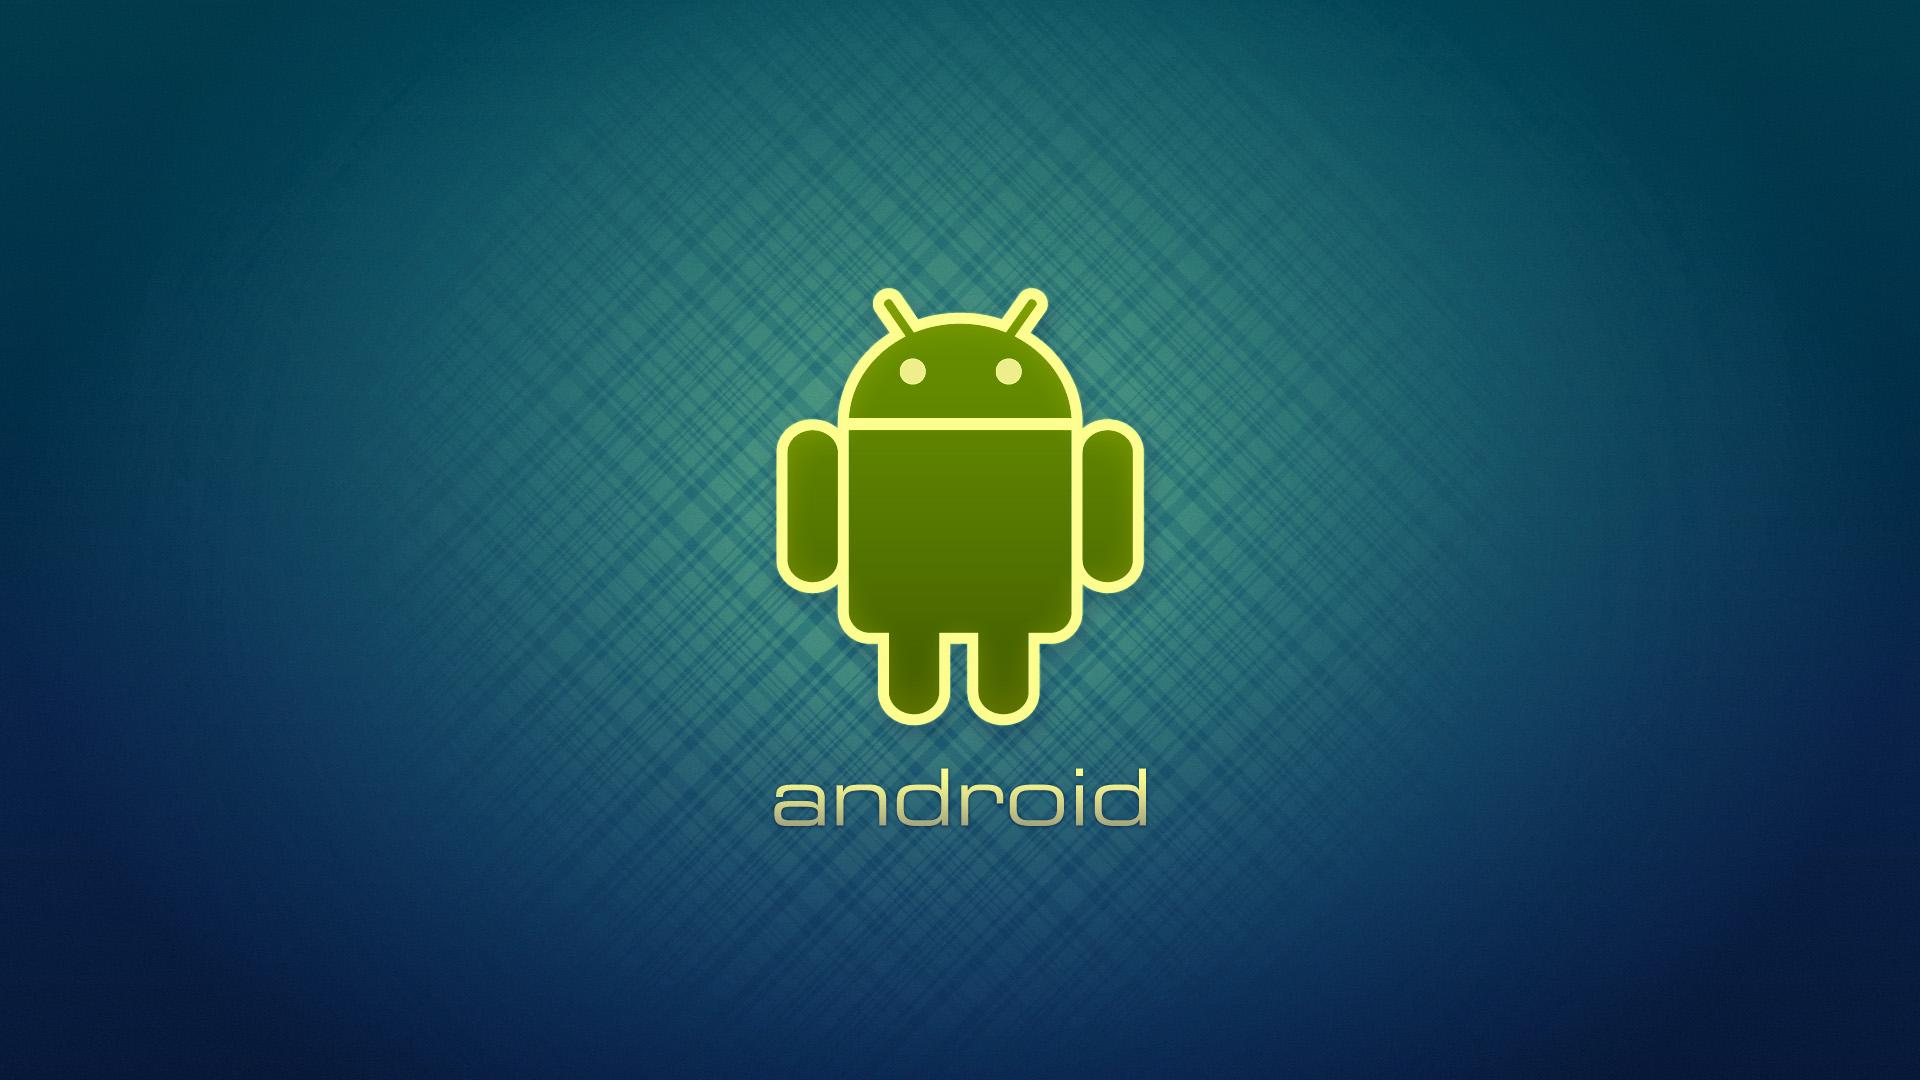 Google Android Wallpaper is a hi res Wallpaper for pc desktopslaptops 1920x1080